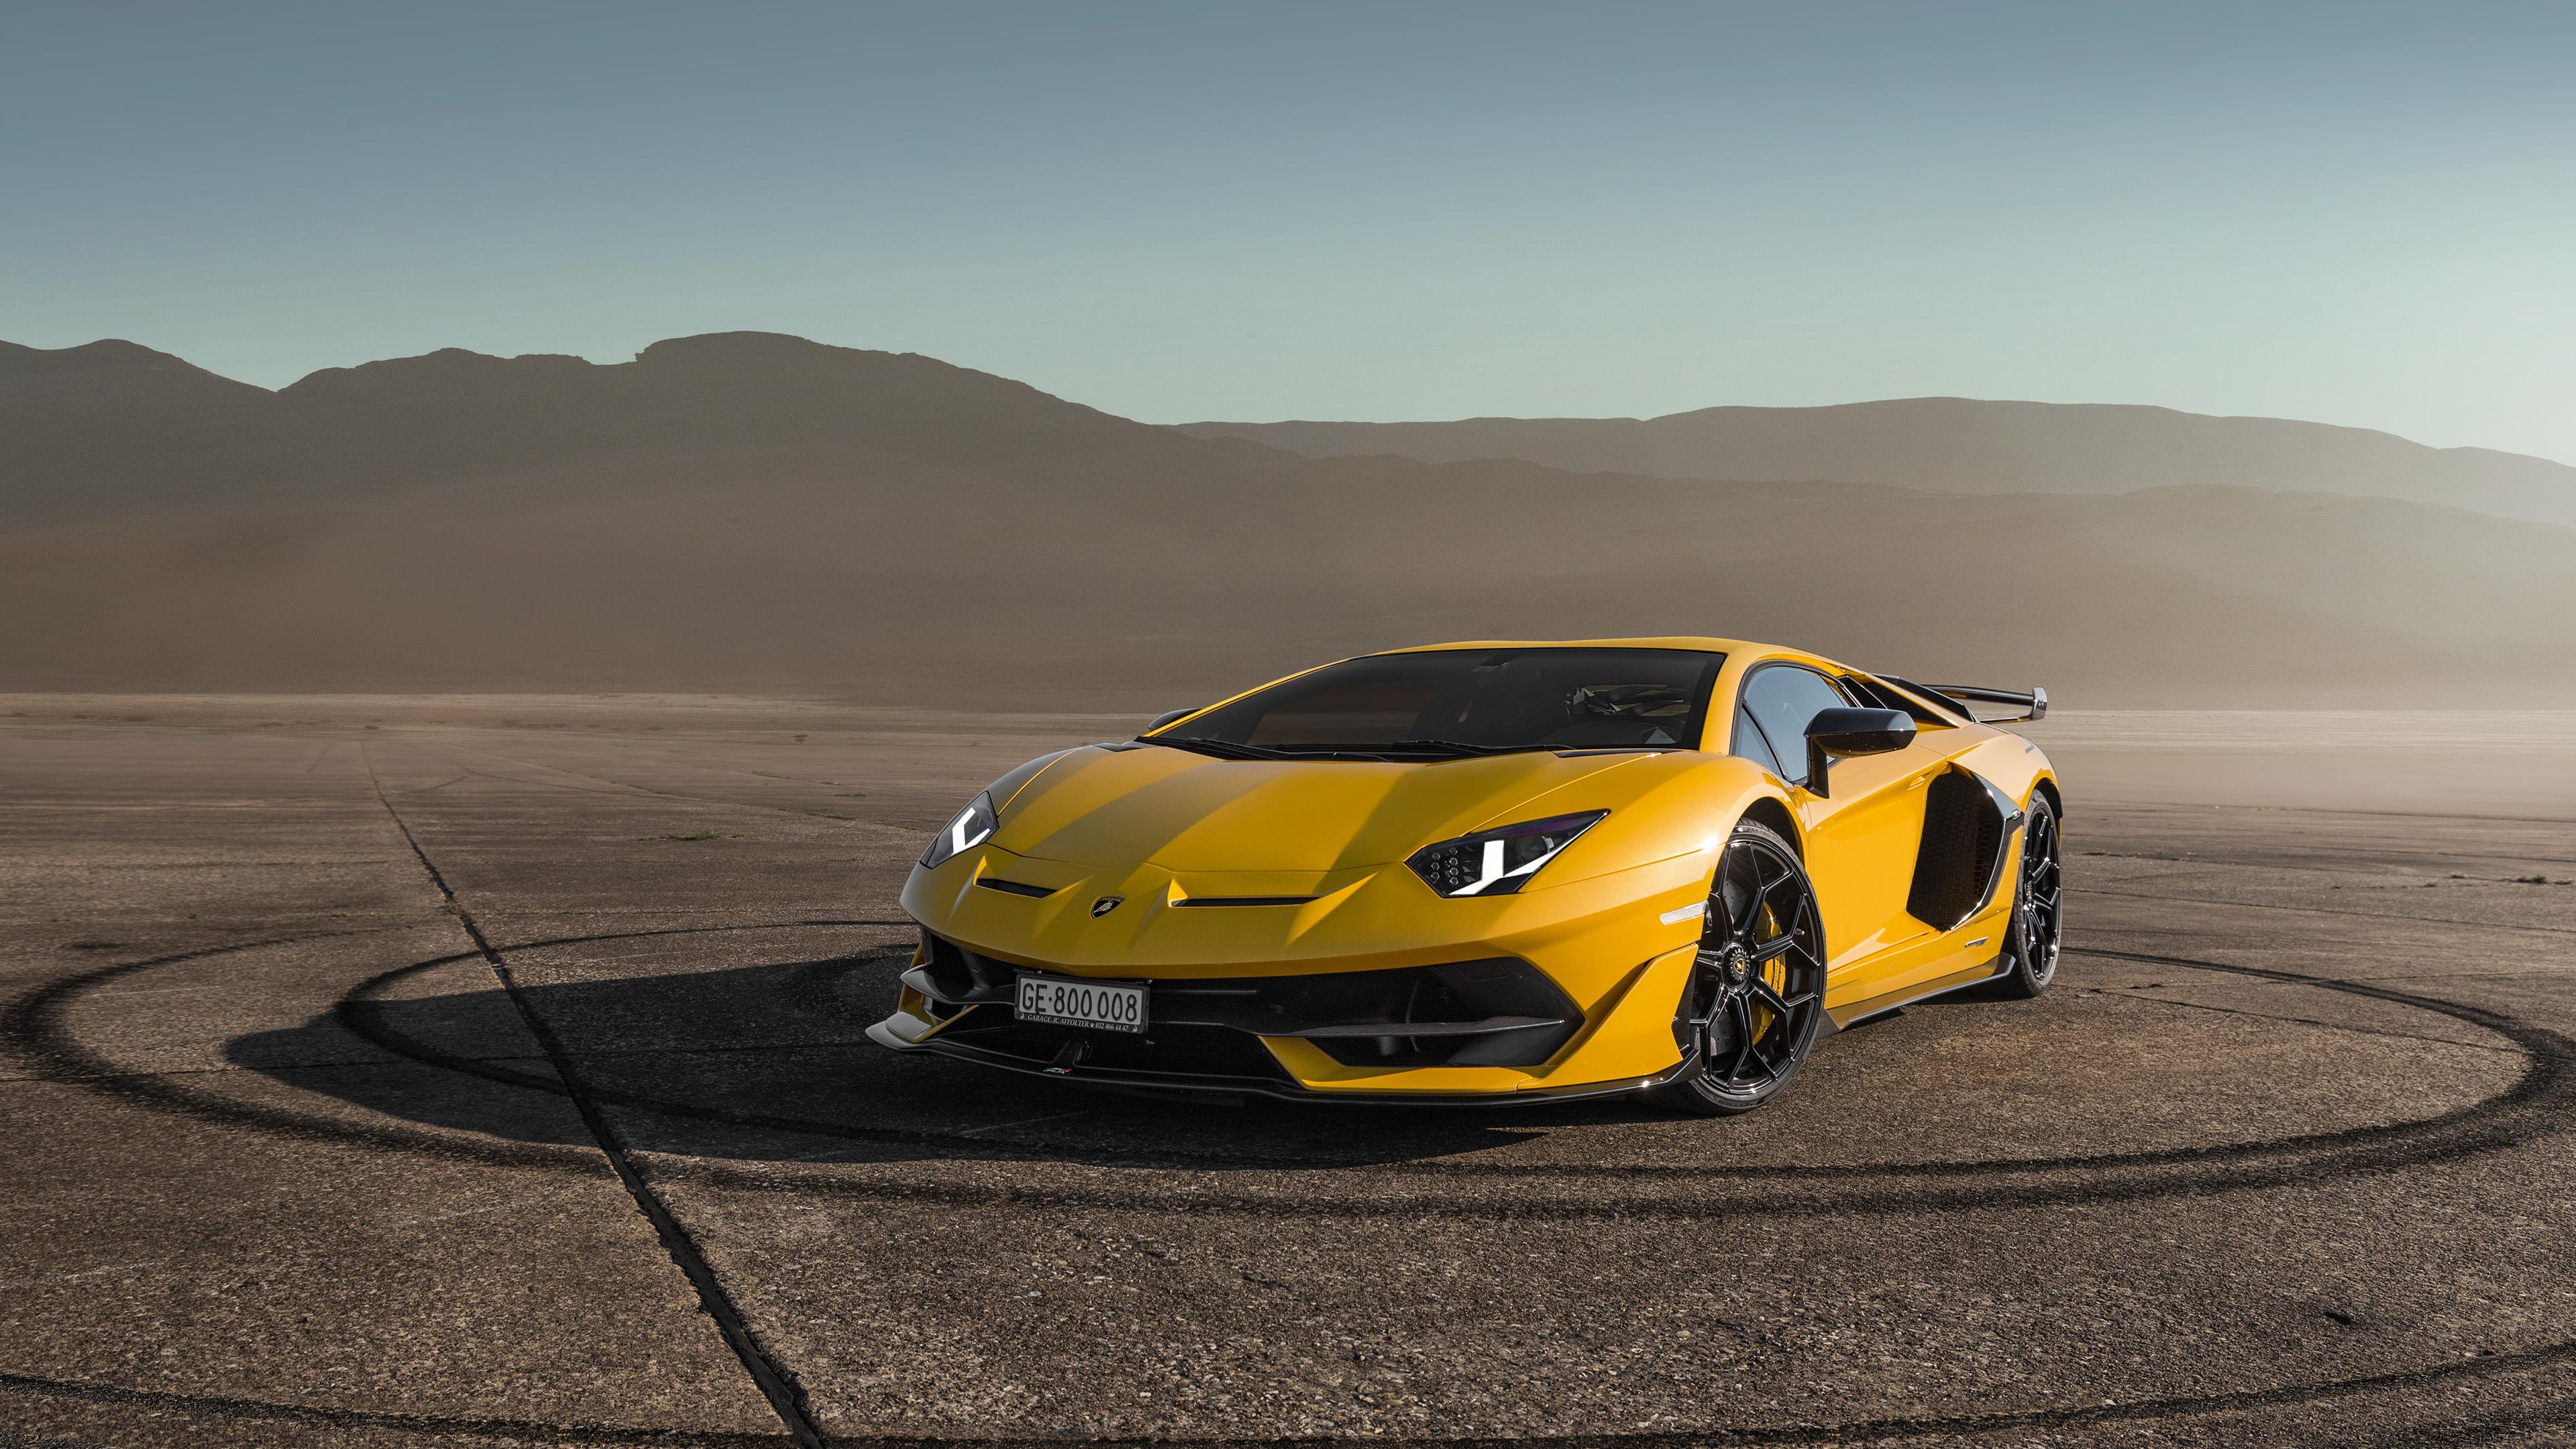 Wallpaper 4k Lamborghini Aventardor Svj 4k 2018 Cars